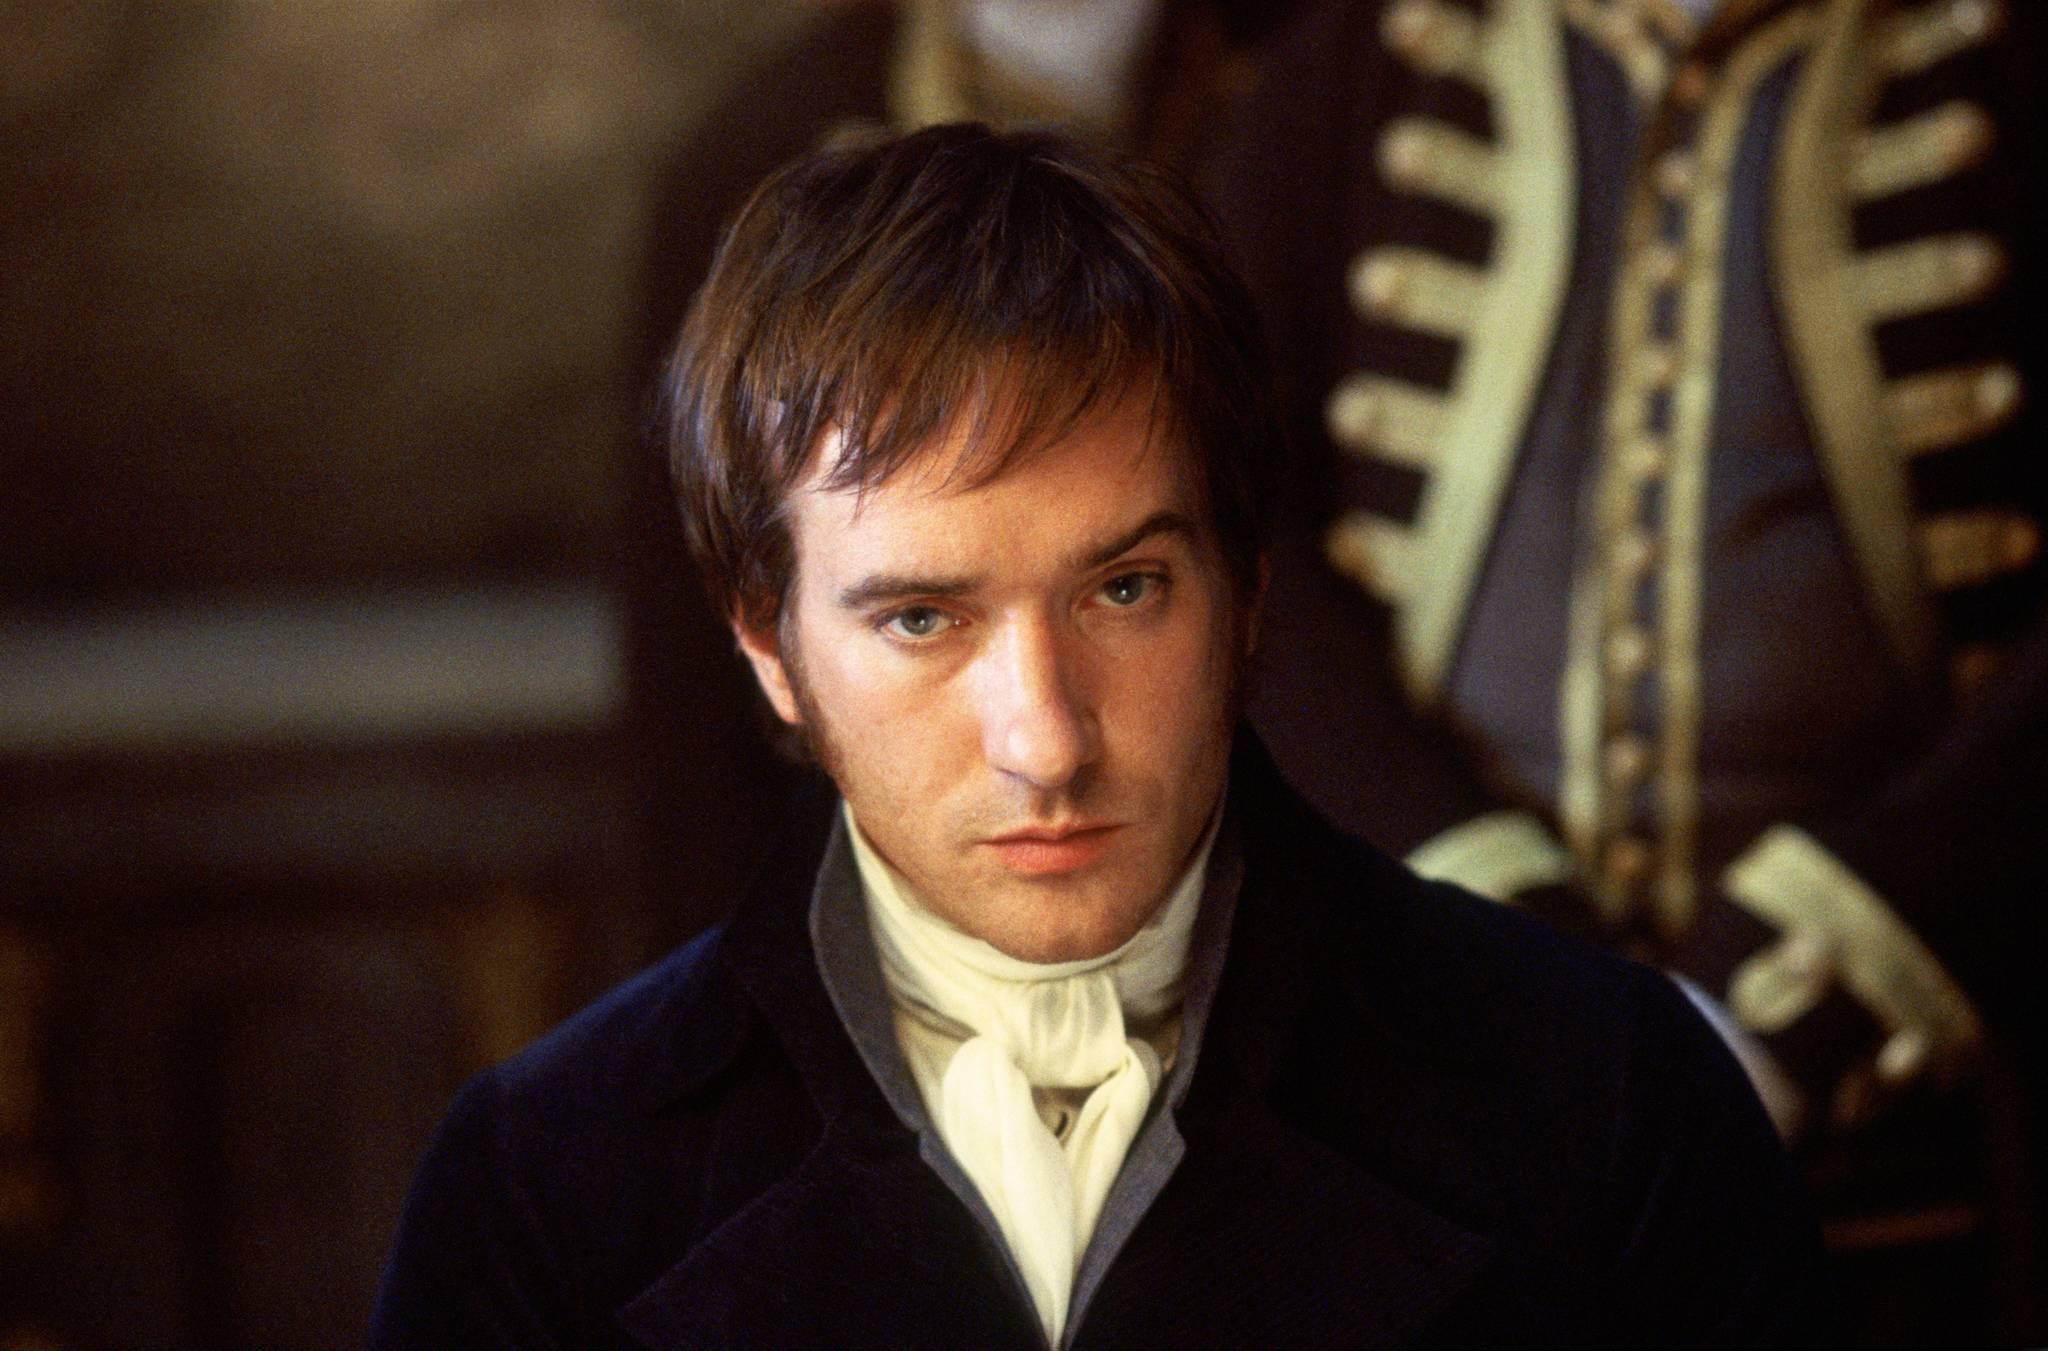 Mr-Darcy-jane-austens-heroes-9589797-2048-1351